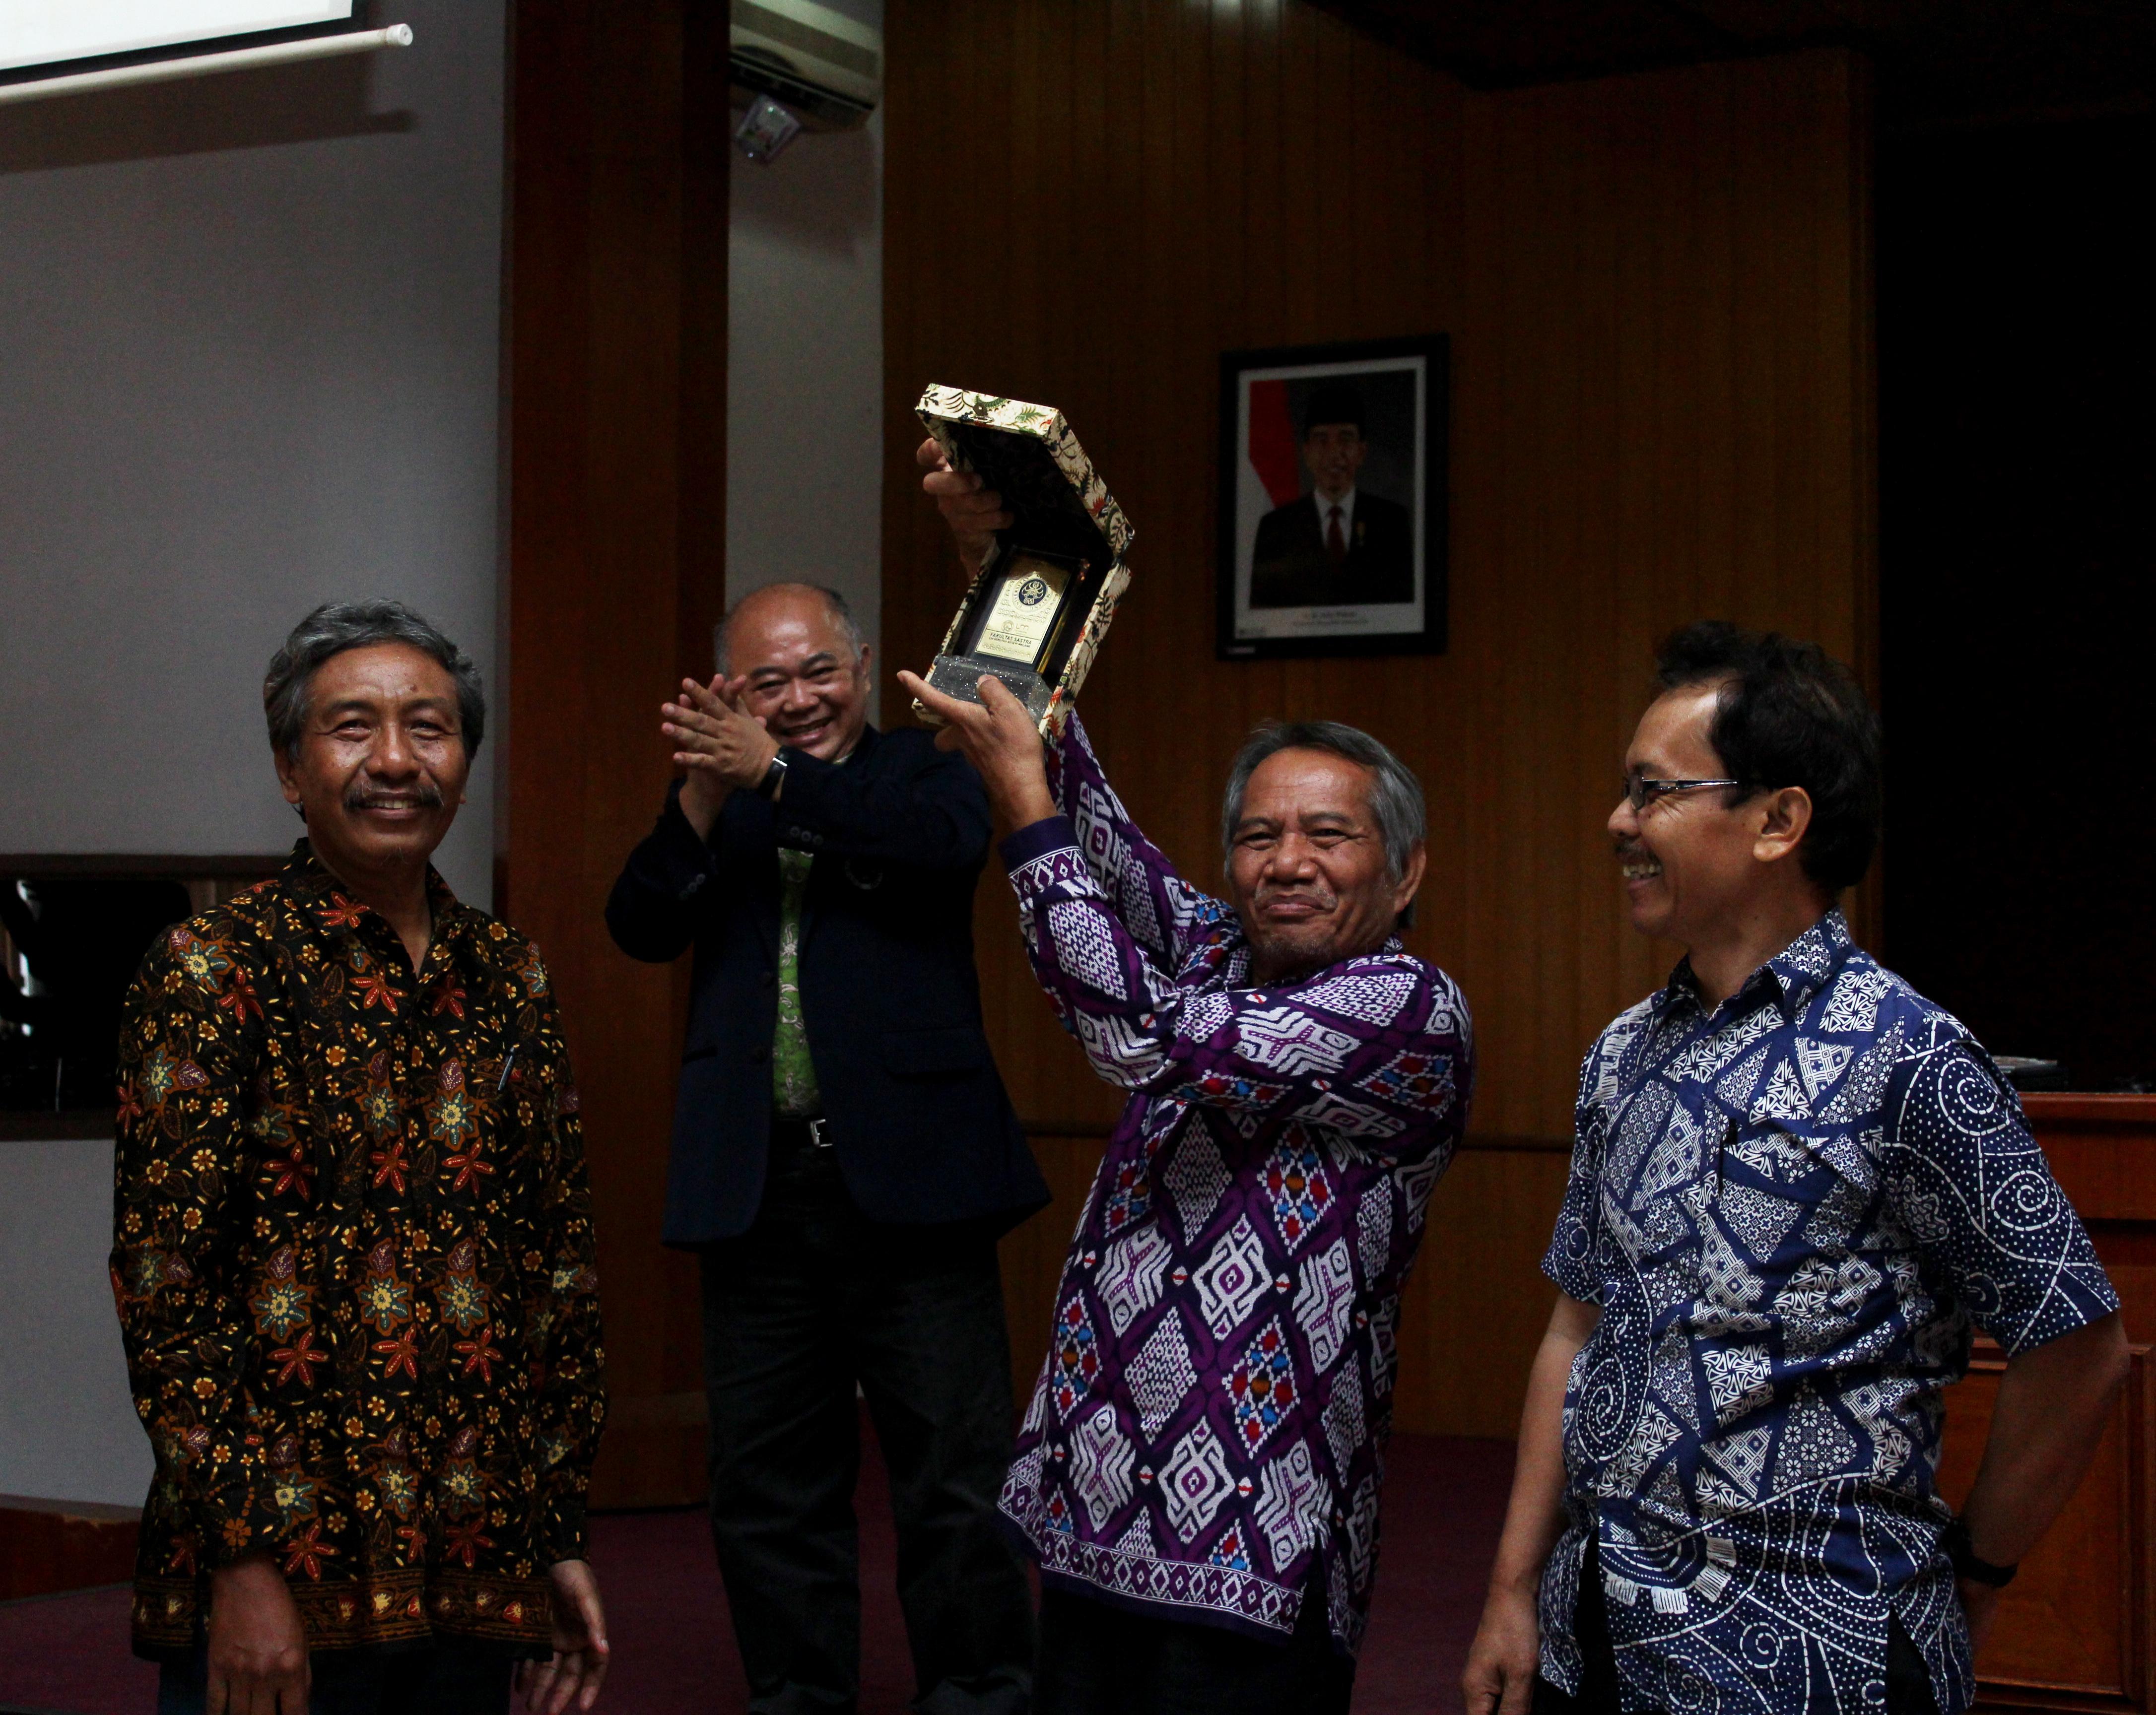 Dr. Hariyanto selaku Ketua Jurusan Seni dan Desain UM memberikan cinderamata kepada narasumber